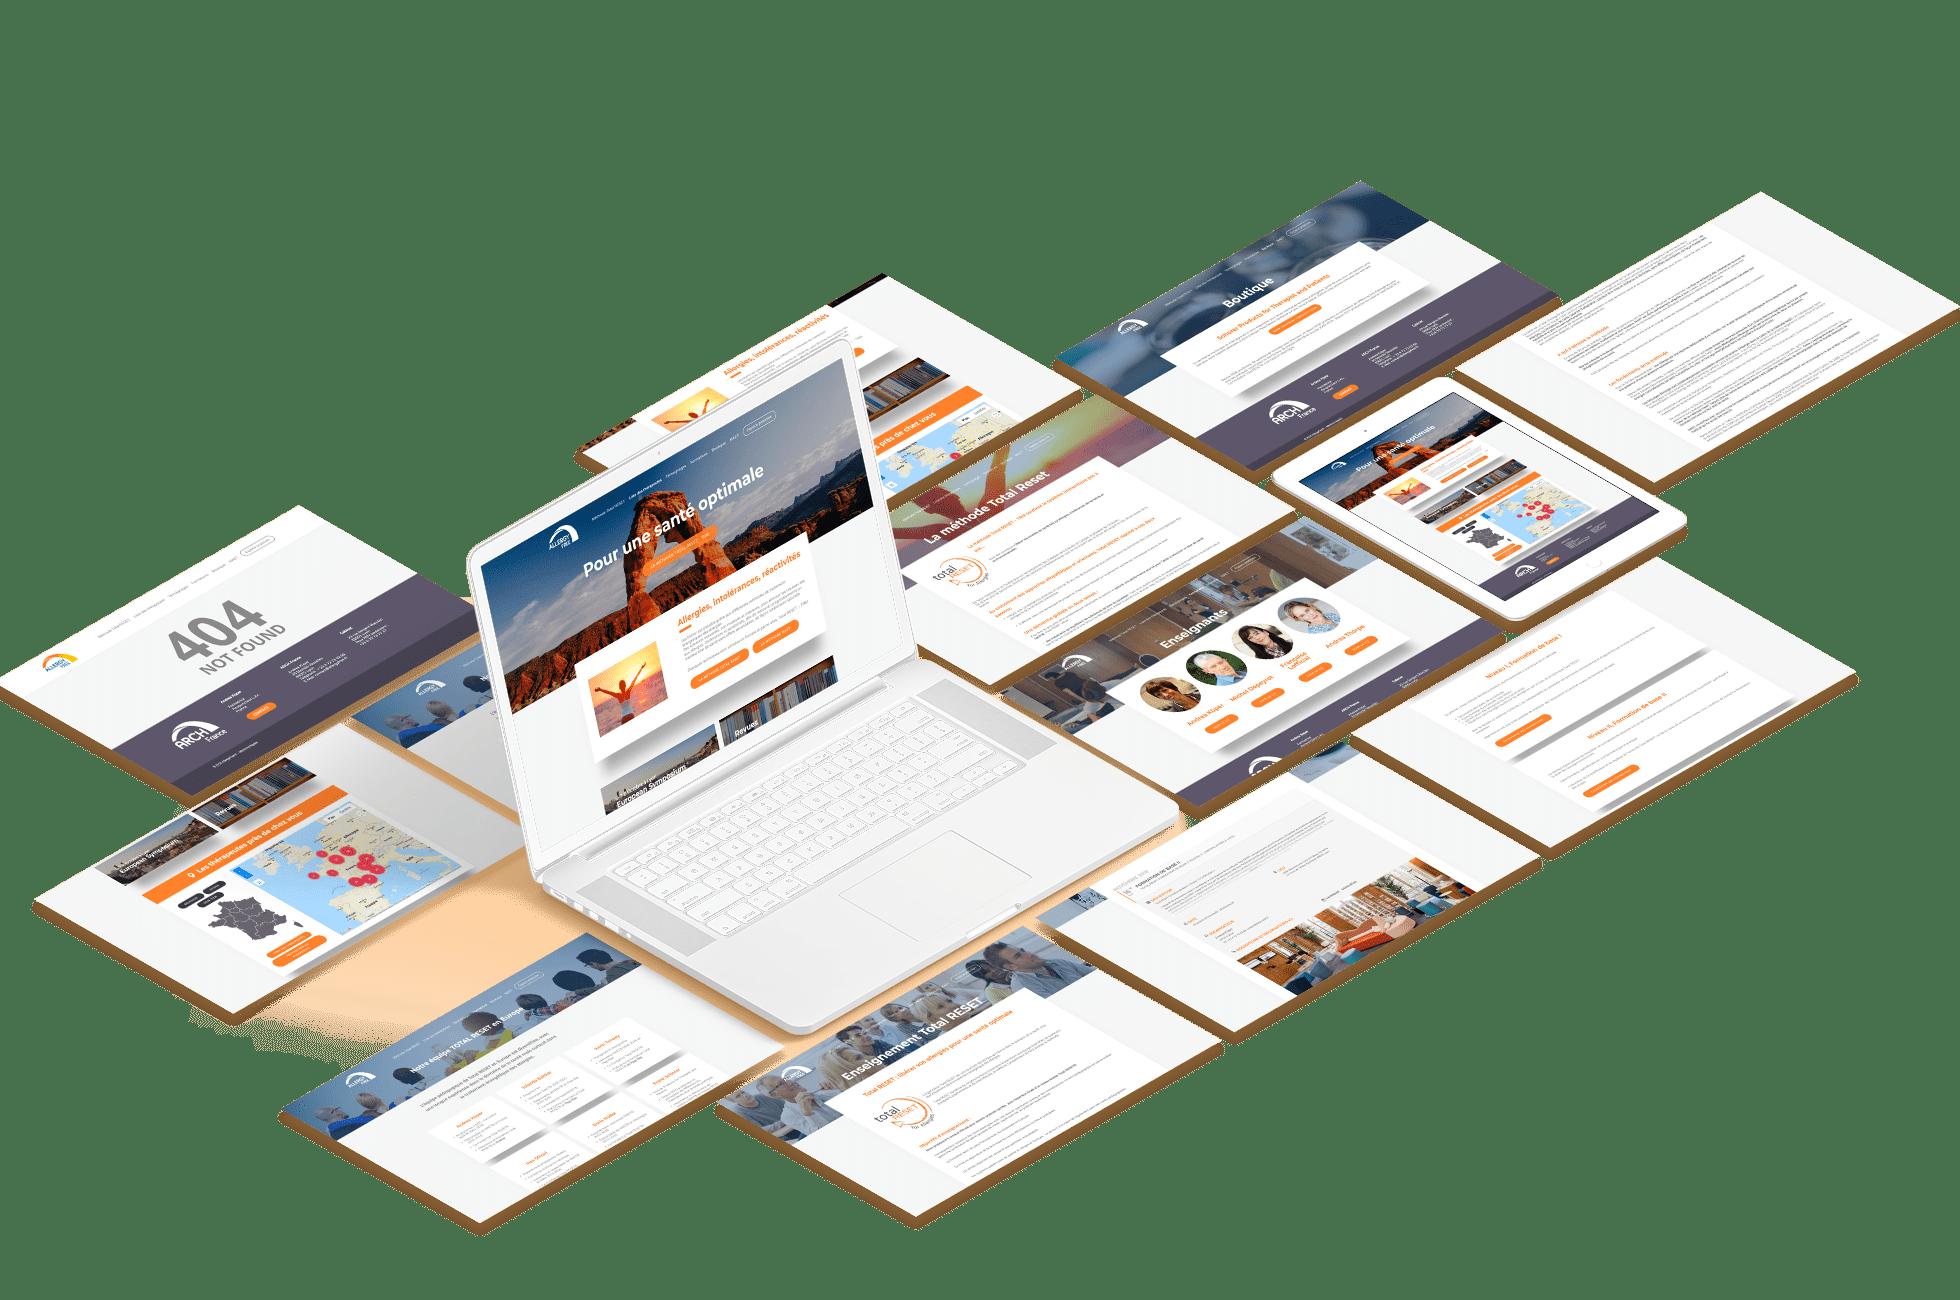 interface allergyfree wordpress agence web design lyon arkanite graphisme developpement logo illustrations ecommerce application mobile